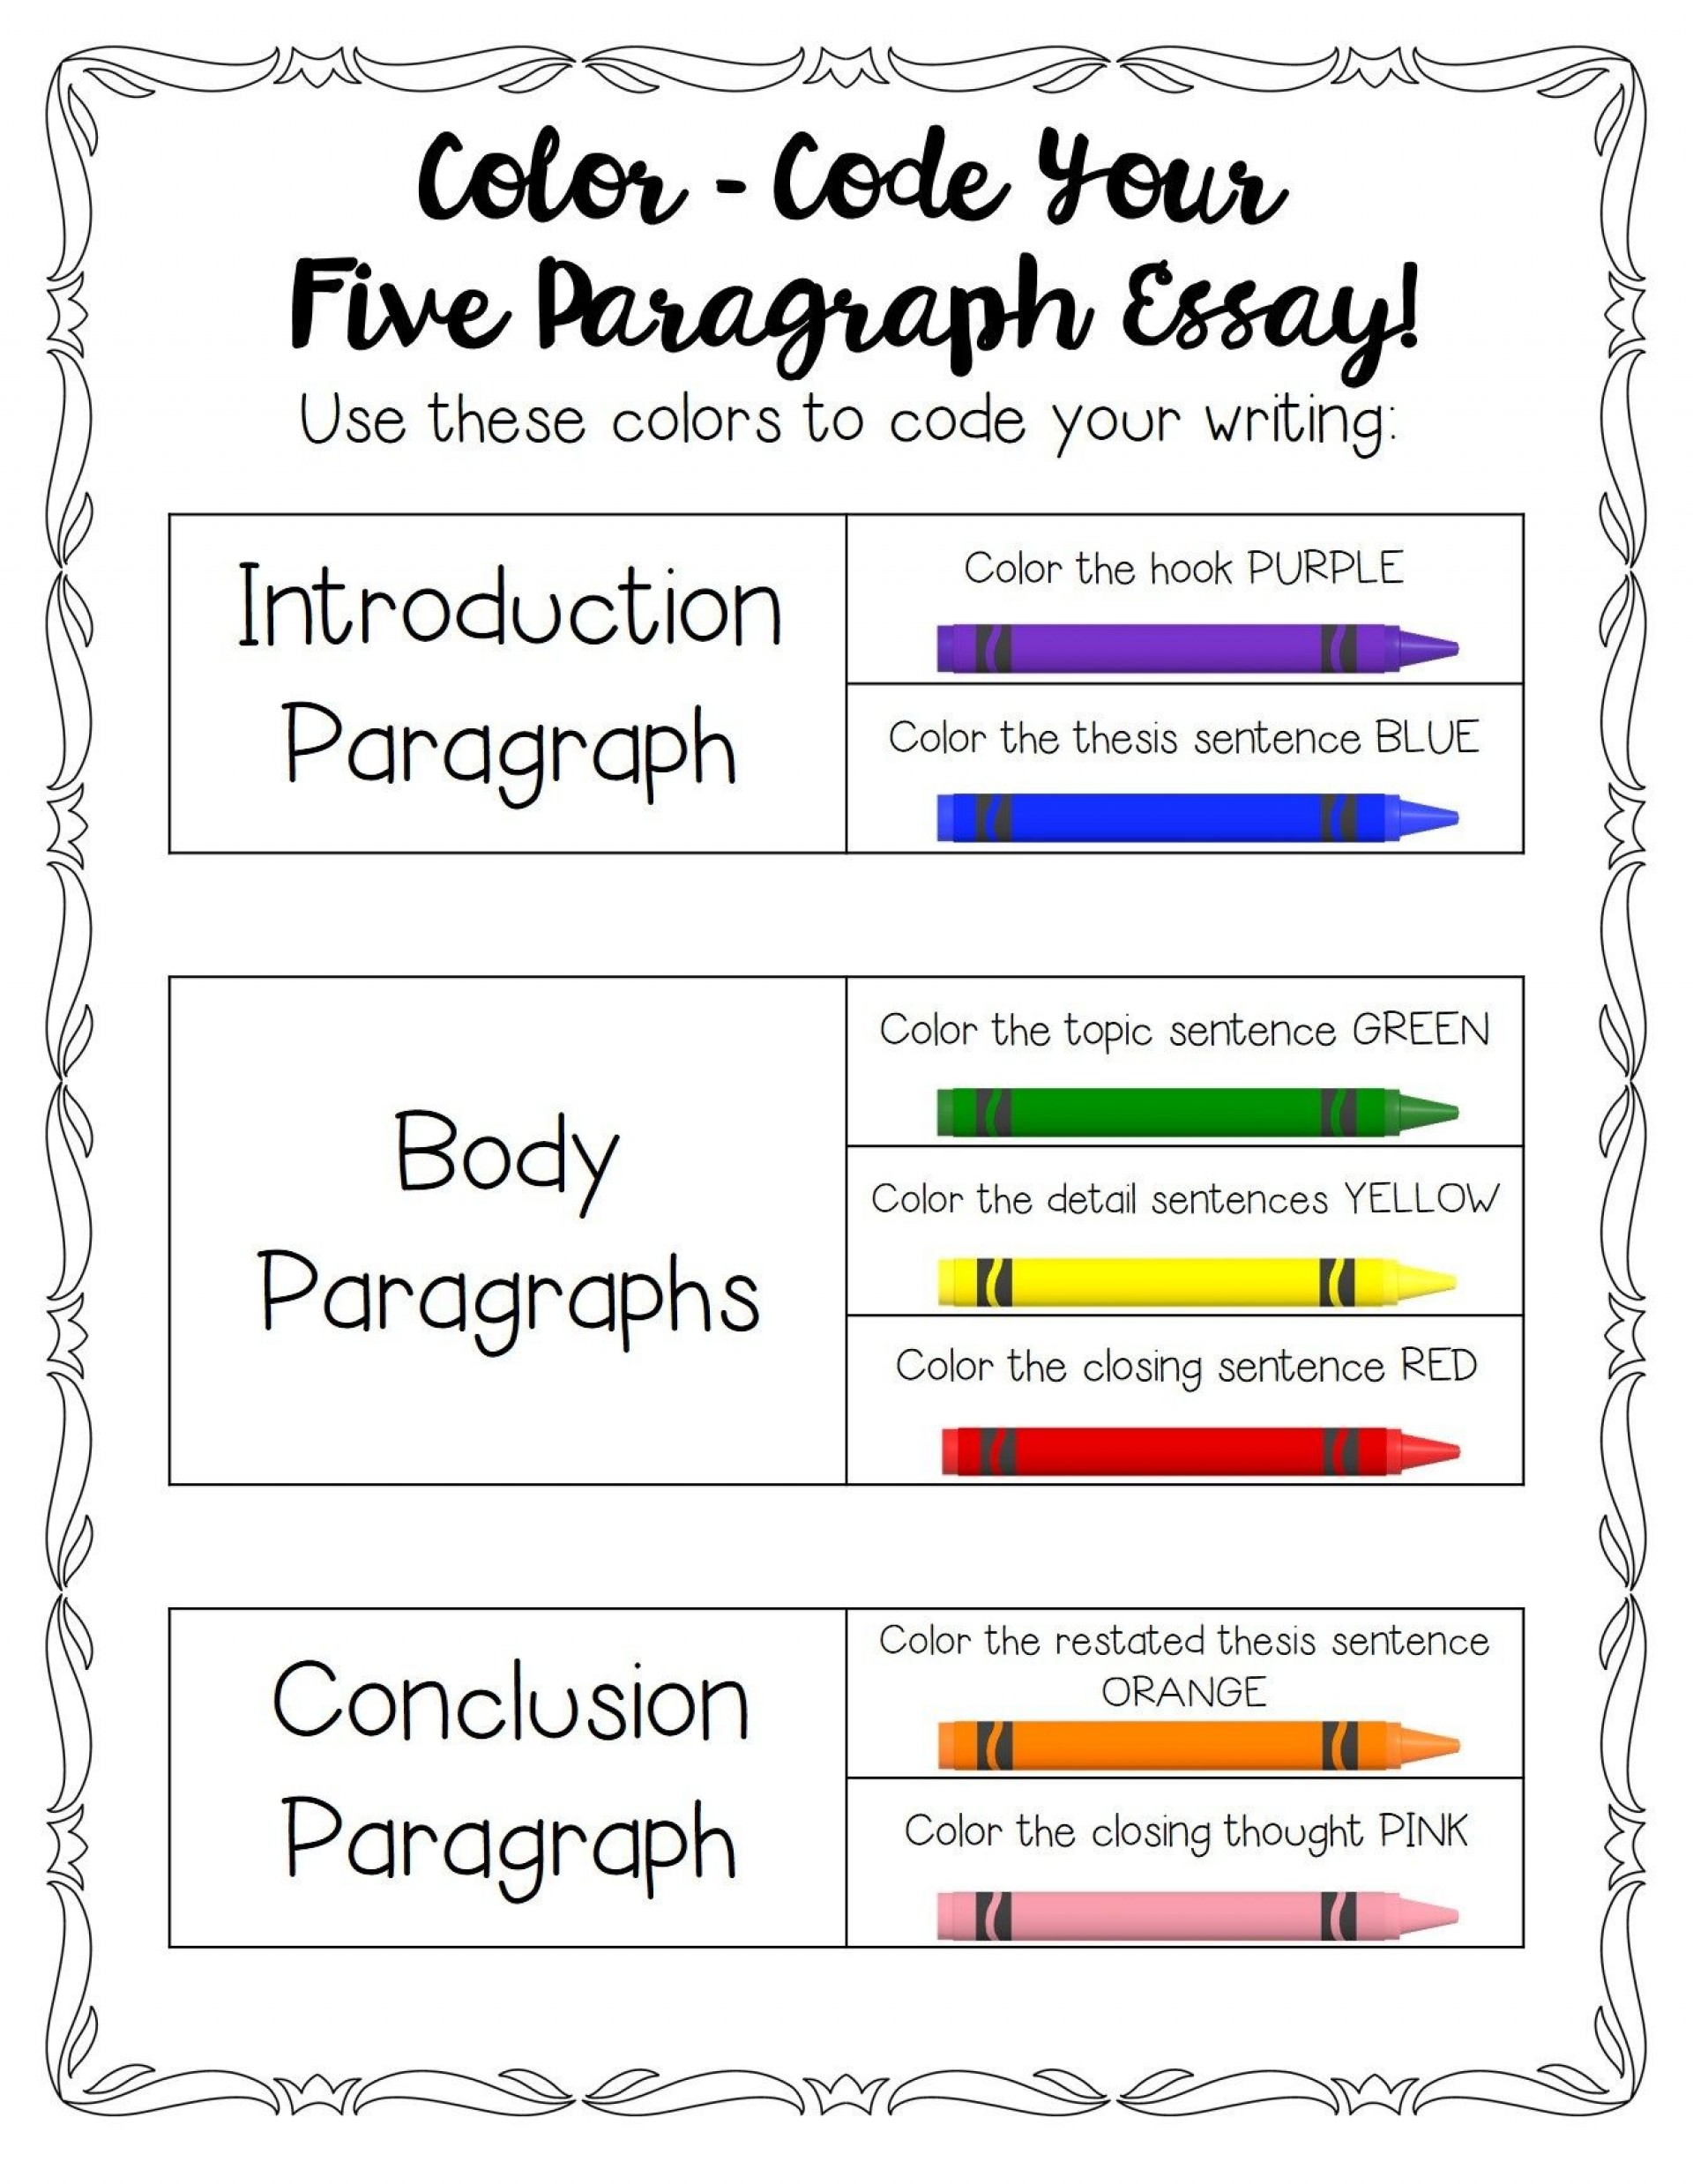 003 Five Paragraph Essay Format Stirring Teaching Argumentative 1920